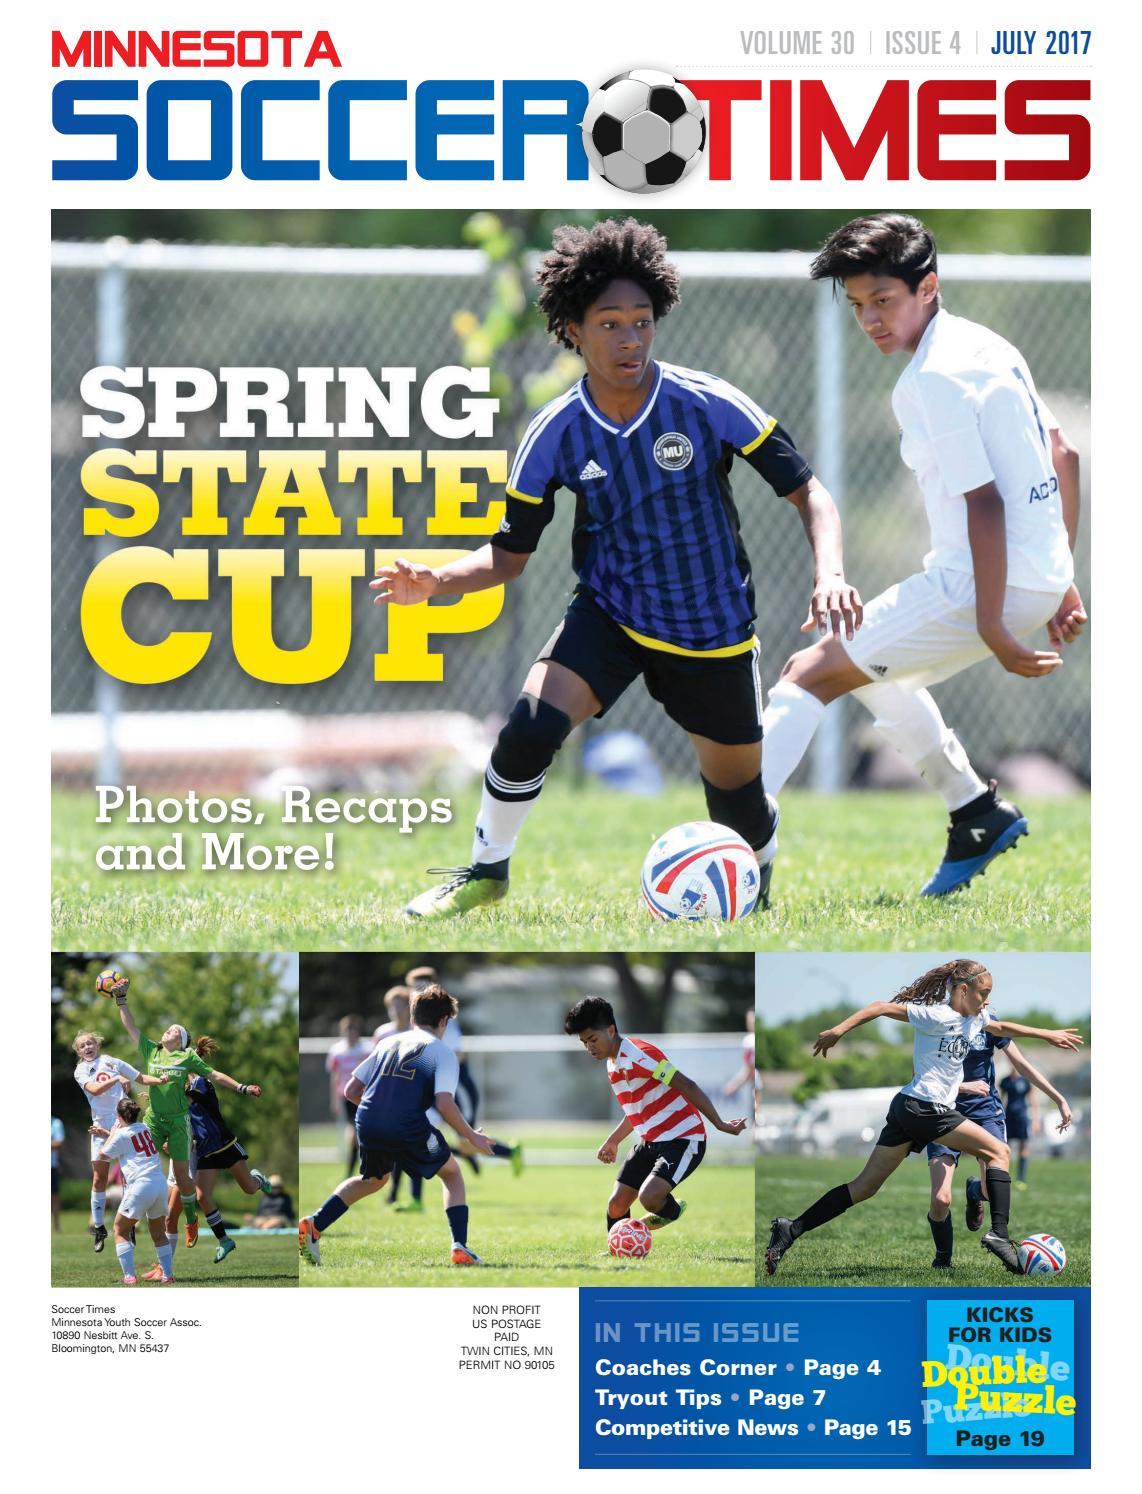 7382e61ab Minnesota Soccer Times July 2017 by Varsity Communications - issuu